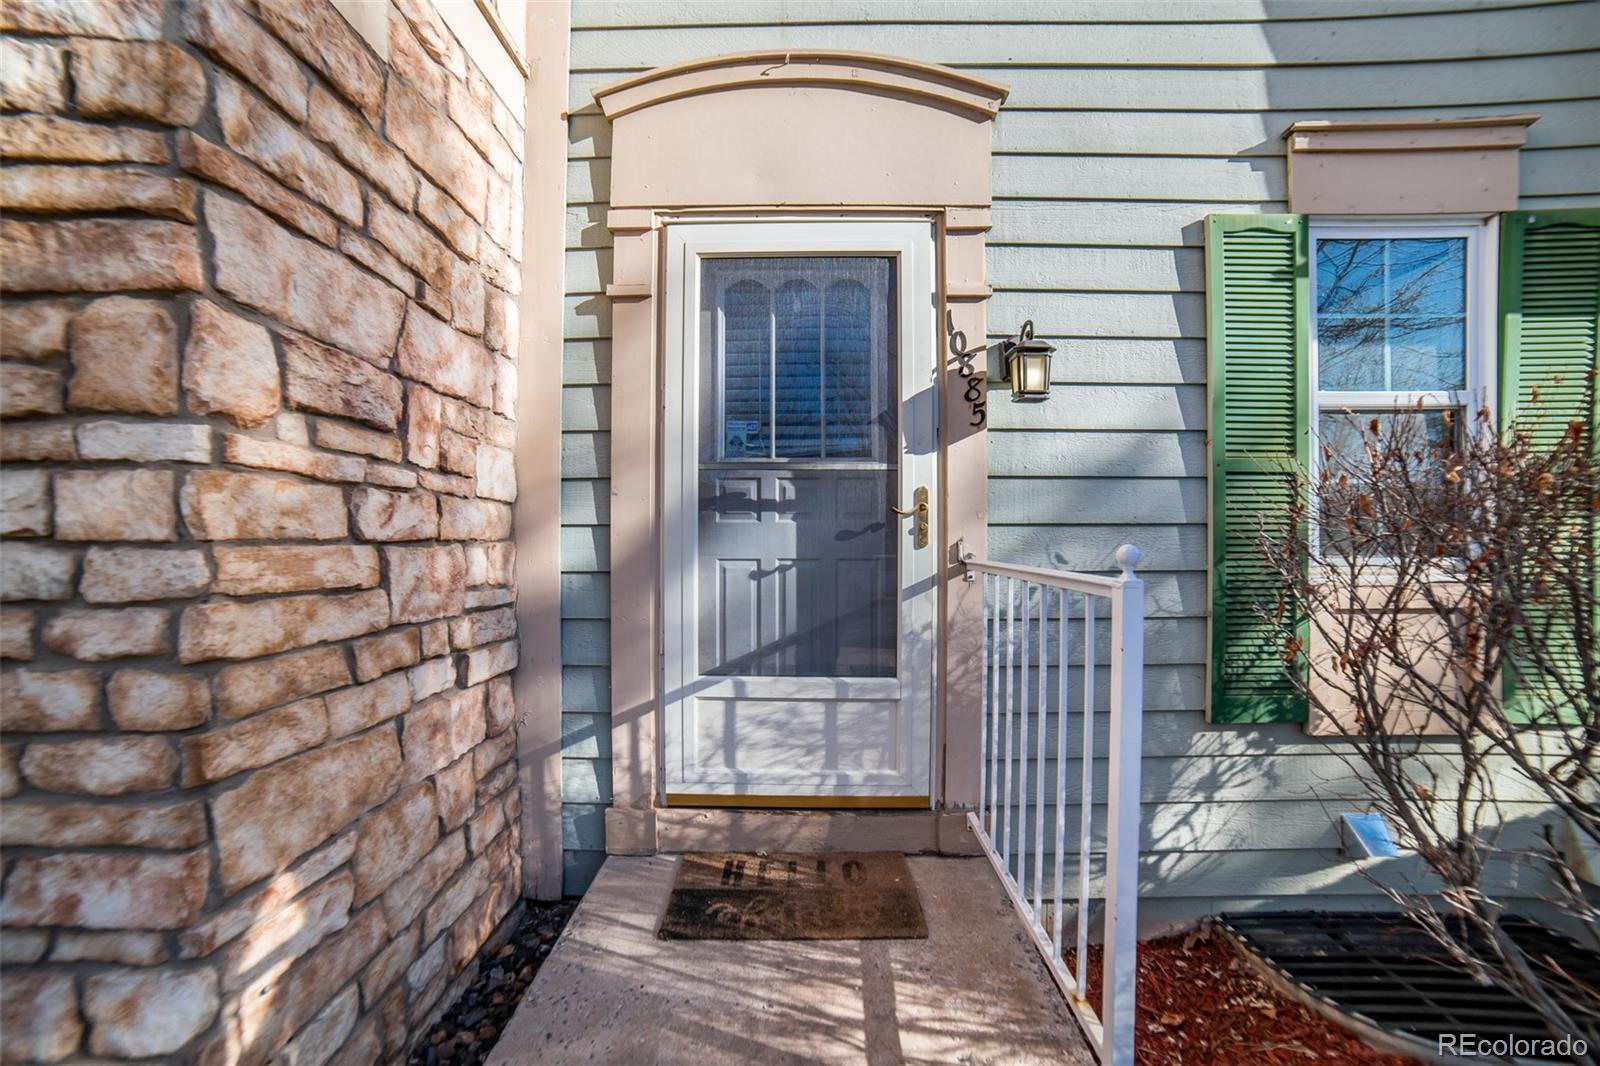 MLS# 5669363 - 3 - 10885 W Dartmouth Avenue, Lakewood, CO 80227